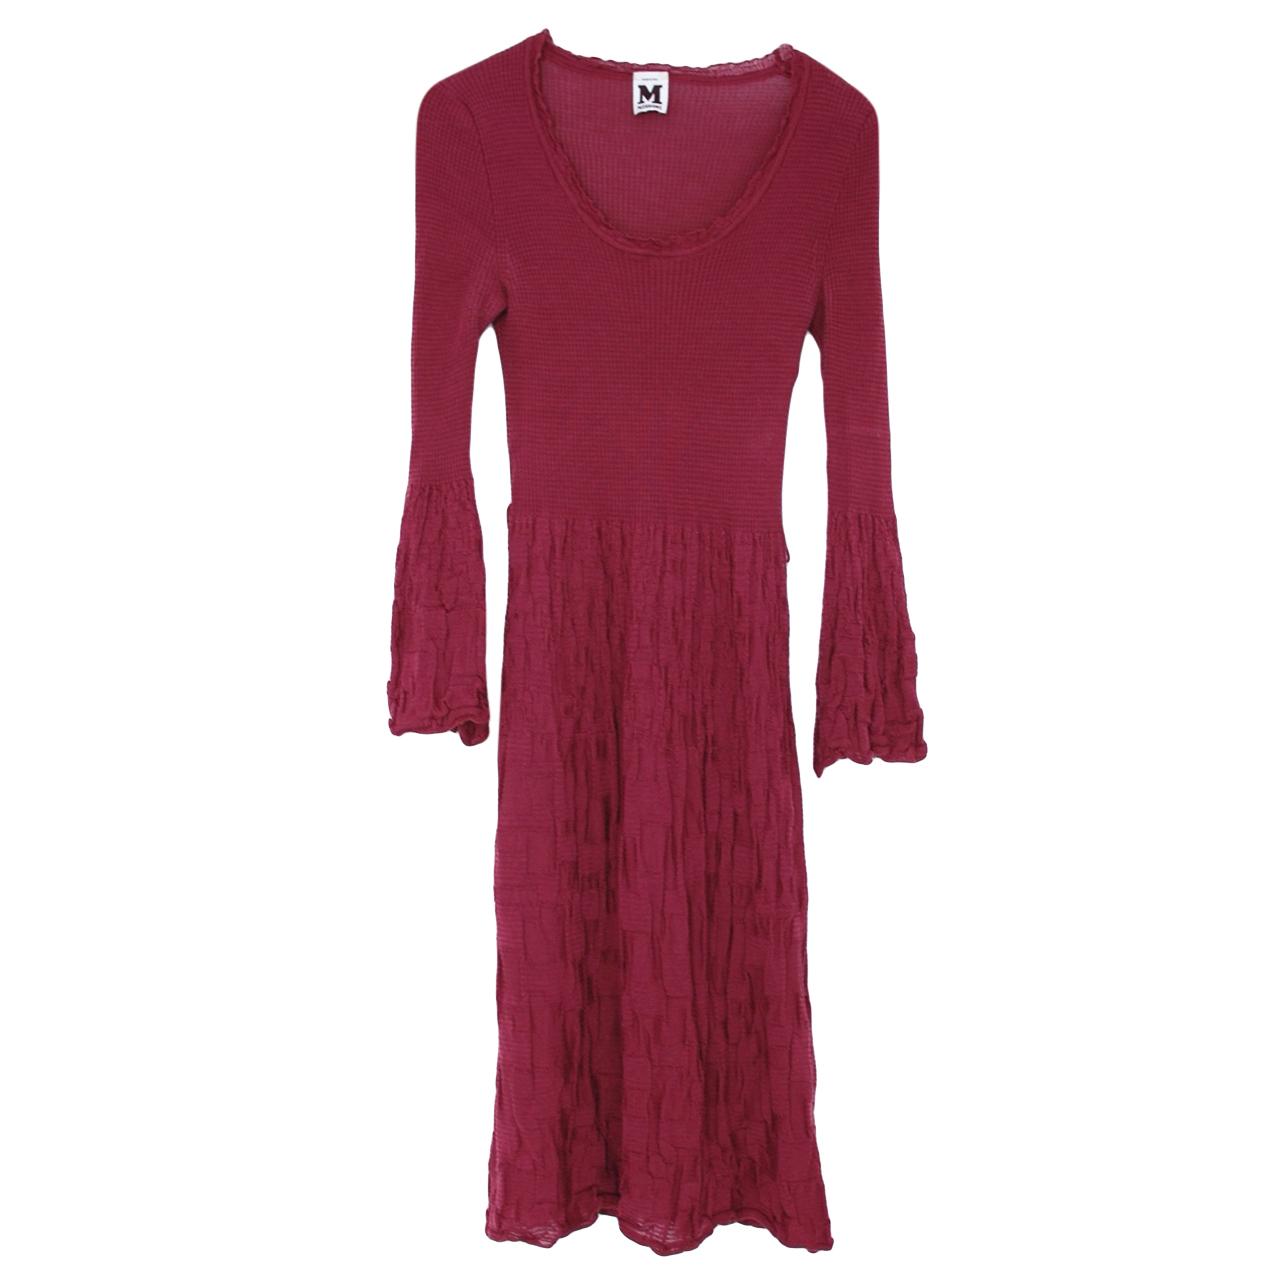 M Missoni Burgundy Knit Merino Wool Blend Dress